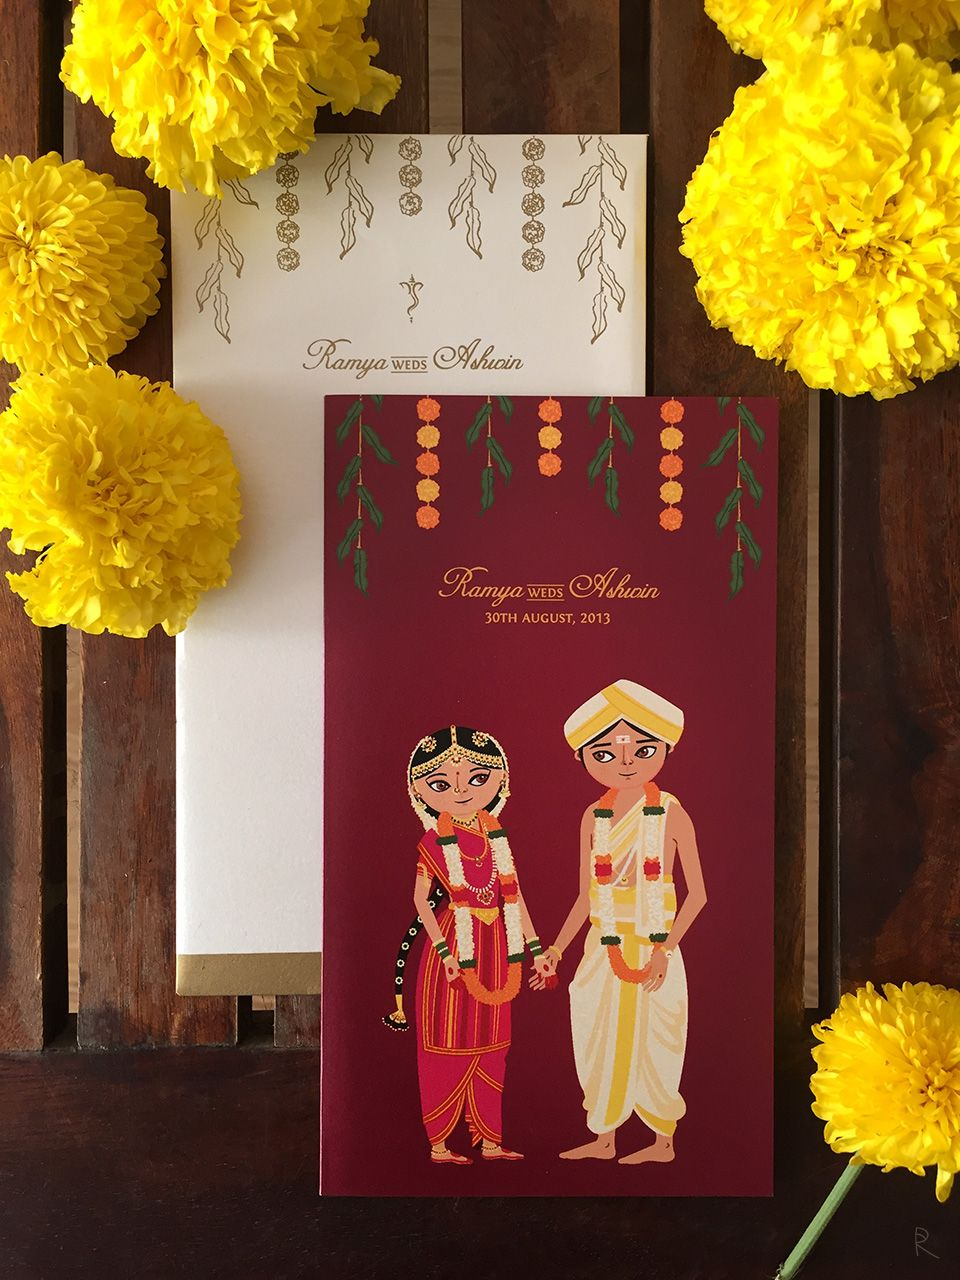 indian wedding invitation illustrated wedding invitations cute indian wedding invitations indian wedding invites unique indian wedding